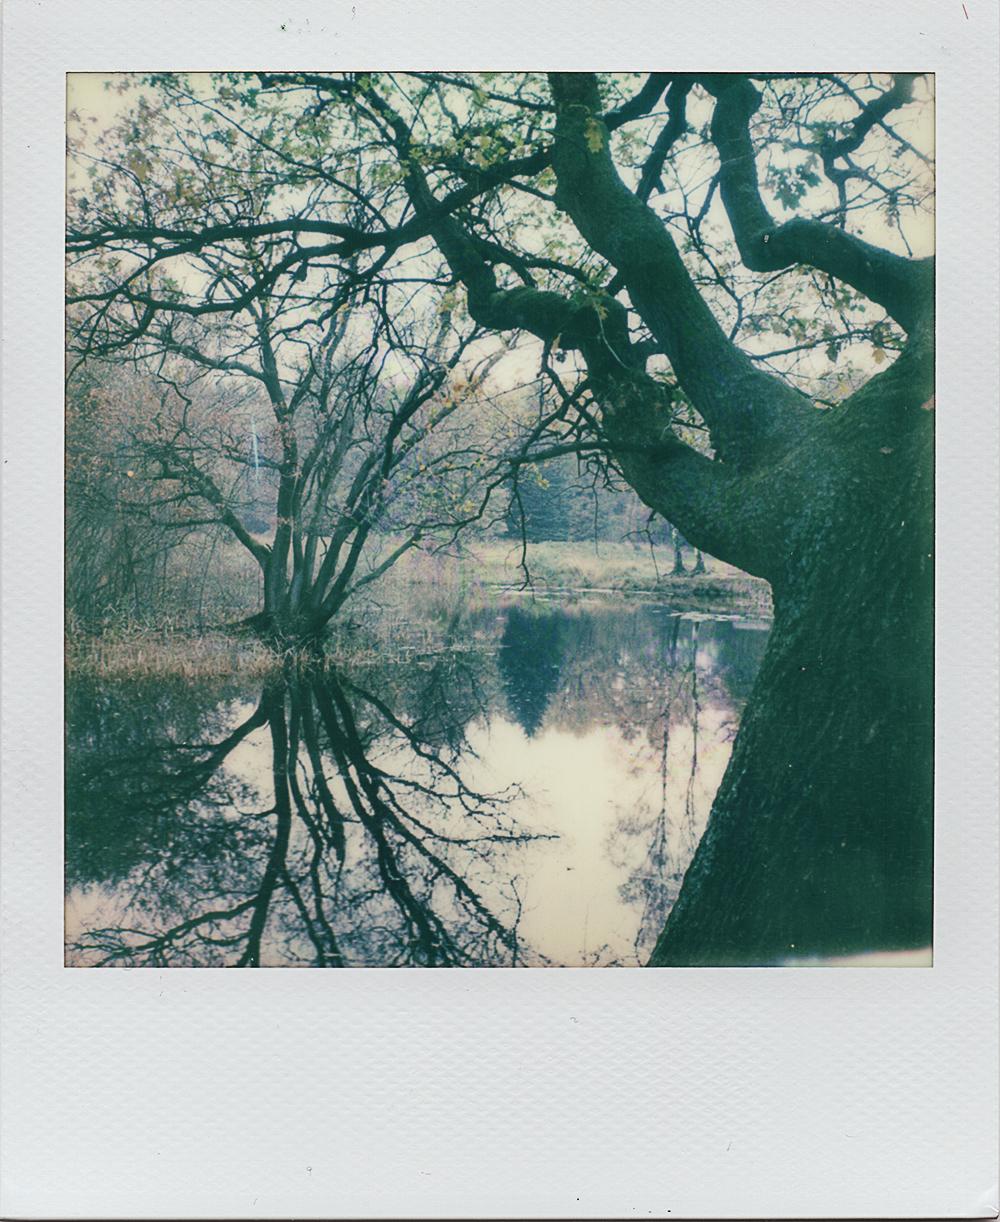 Hold On | Polaroid 680AF | PO 600 Film | Karin Klaus